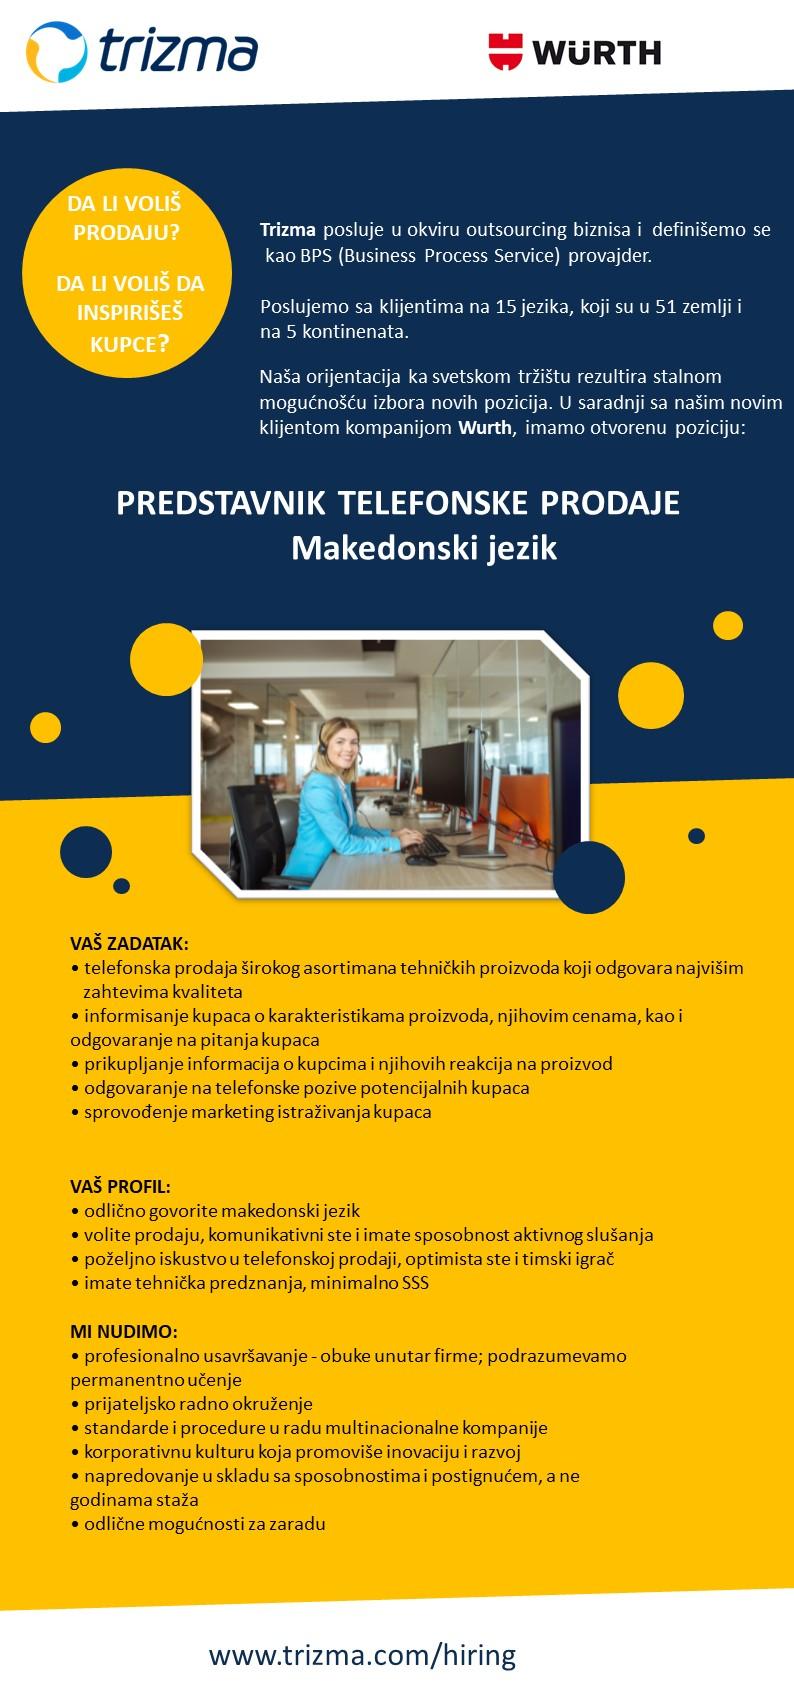 Predstavnik telefonske prodaje za Makedonski jezik